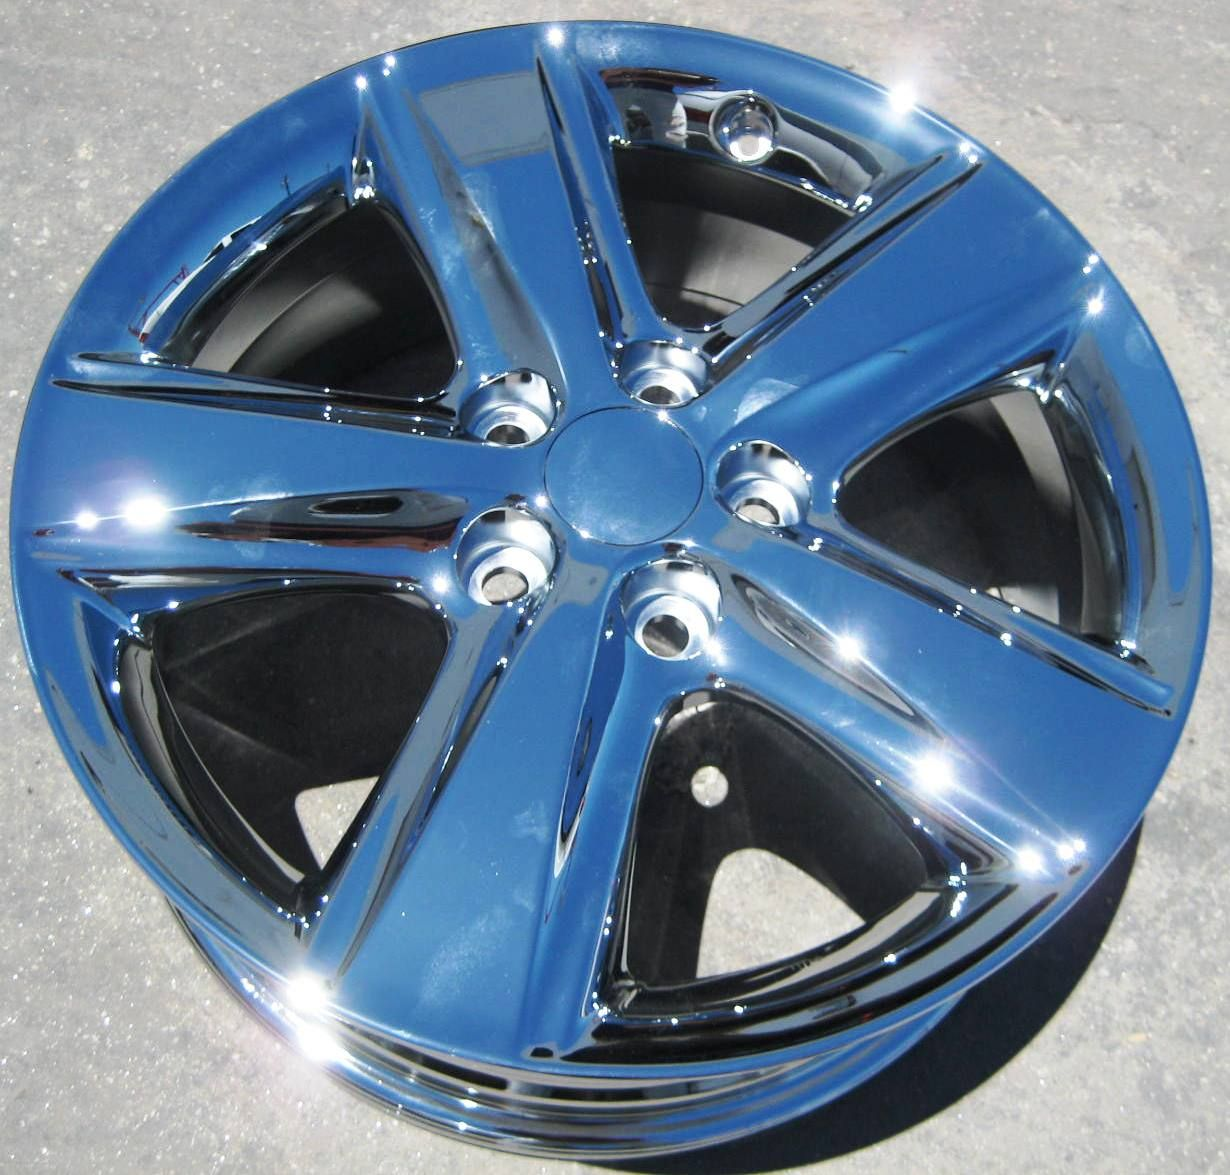 Toyota Camry Chrome Wheels Rims Sienna ES350 ES300 2010 11 Set